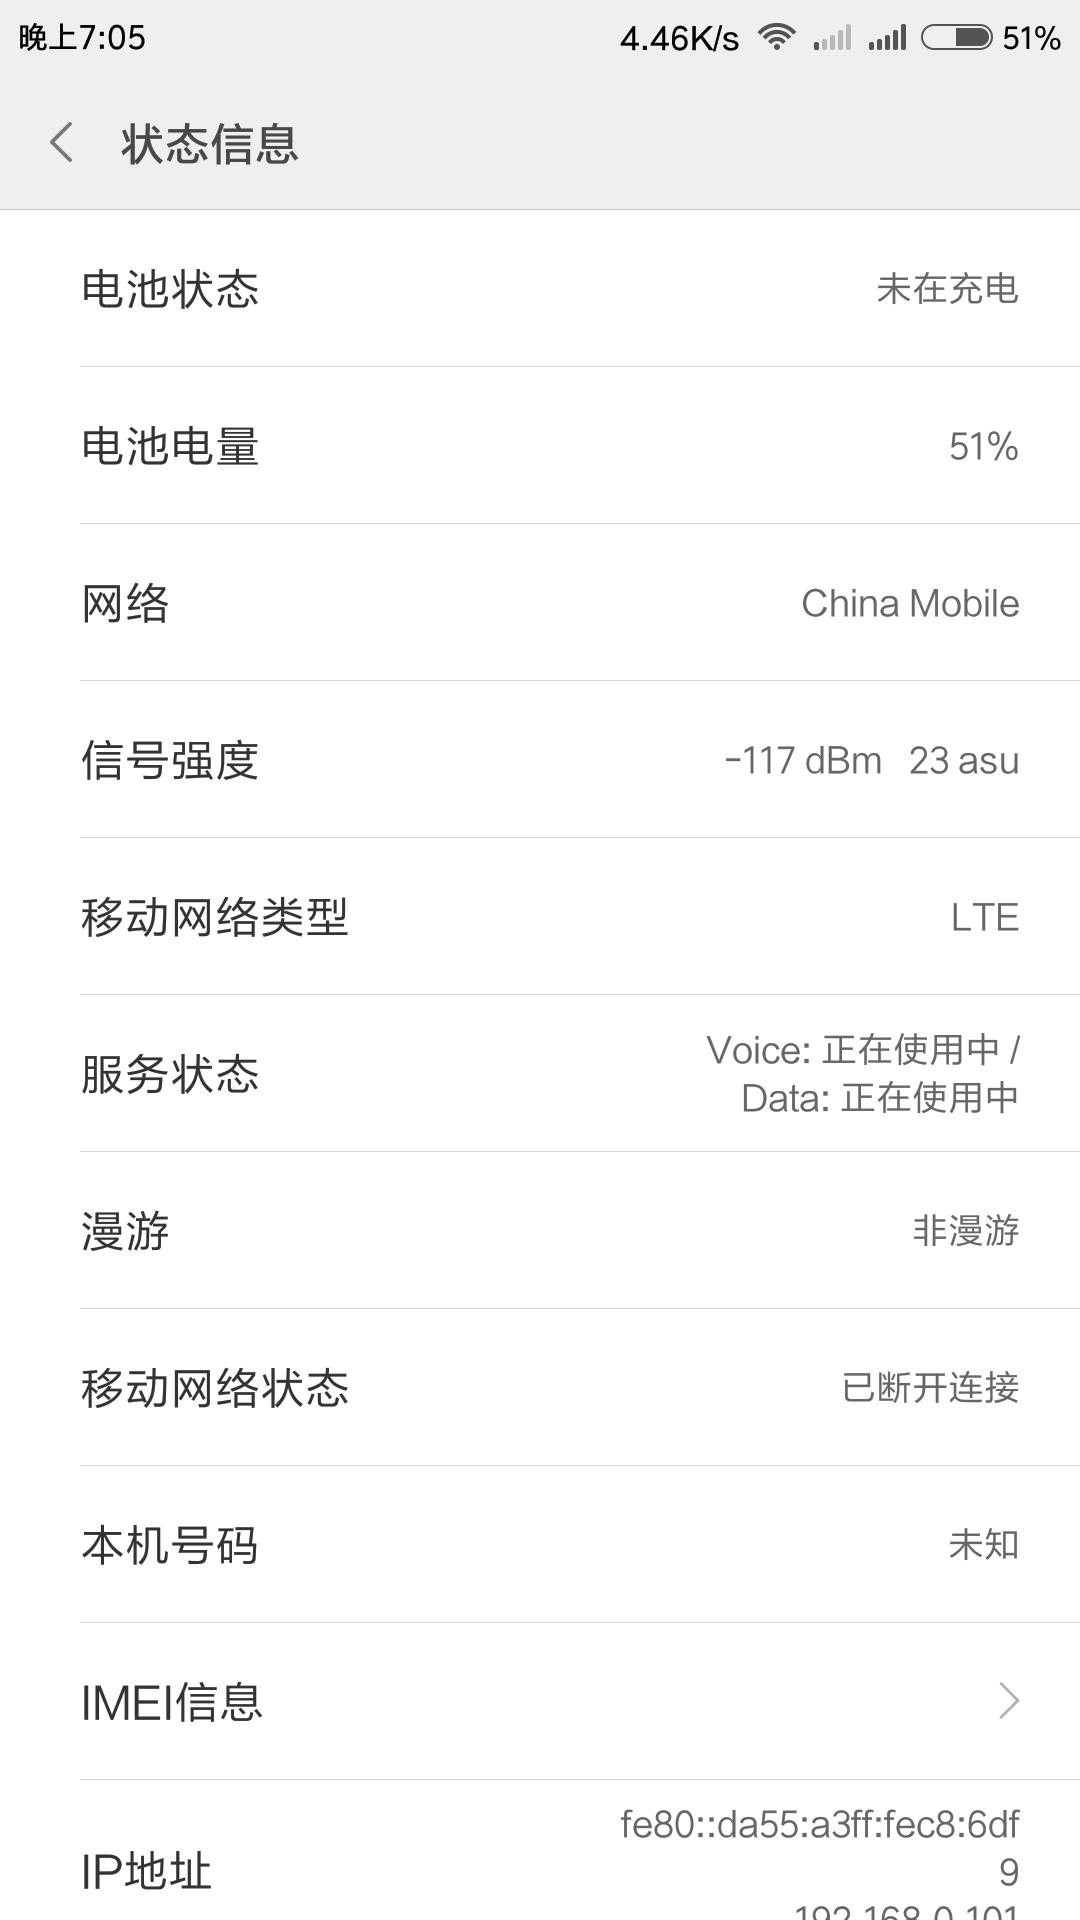 Screenshot_2017-03-05-19-05-53-298_com.android.se.png